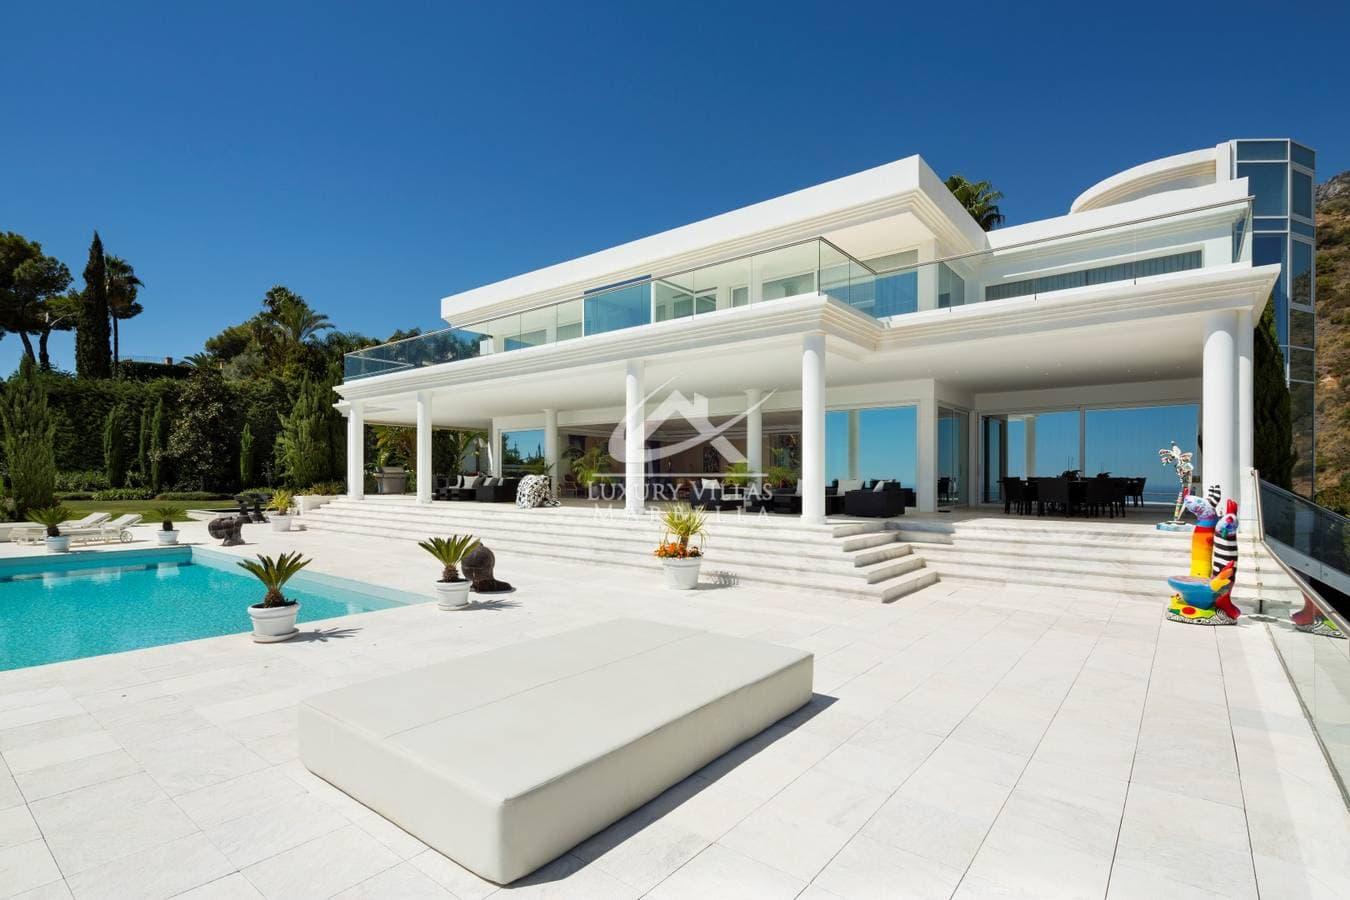 Casa Bel Air